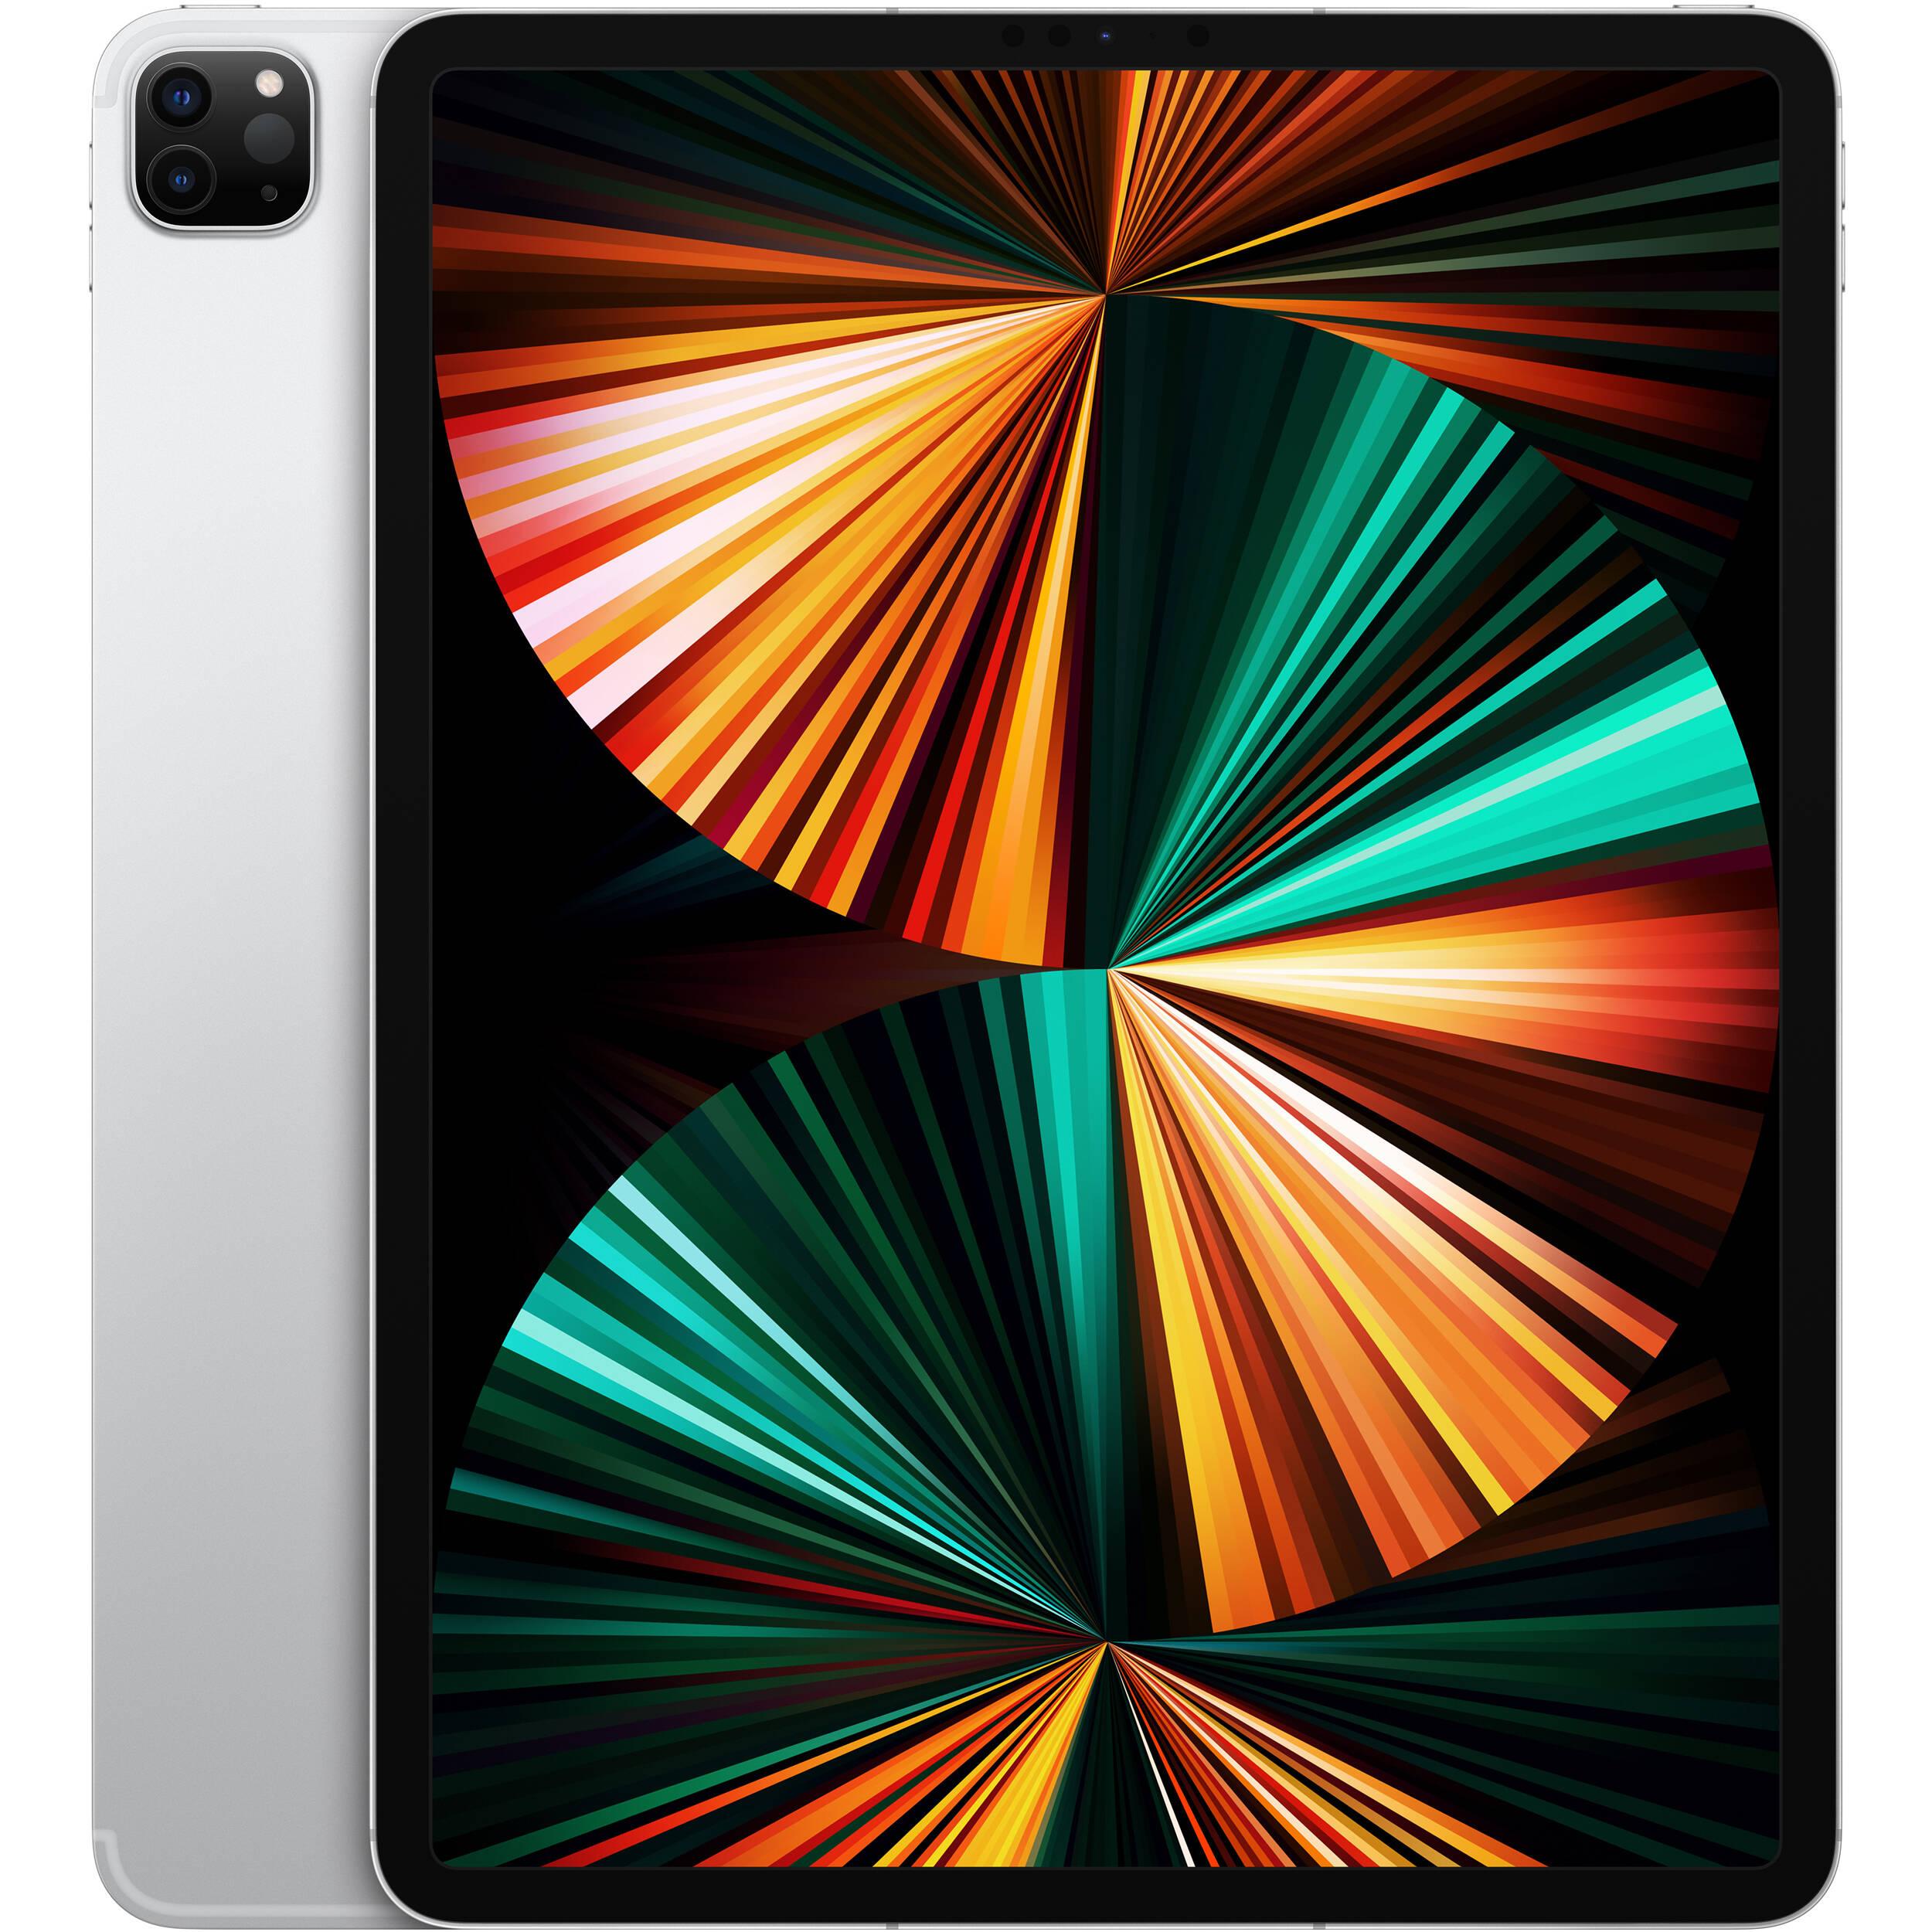 "Apple 12.9"" iPad Pro M1 Chip MHP53LL/A B&H Photo Video"